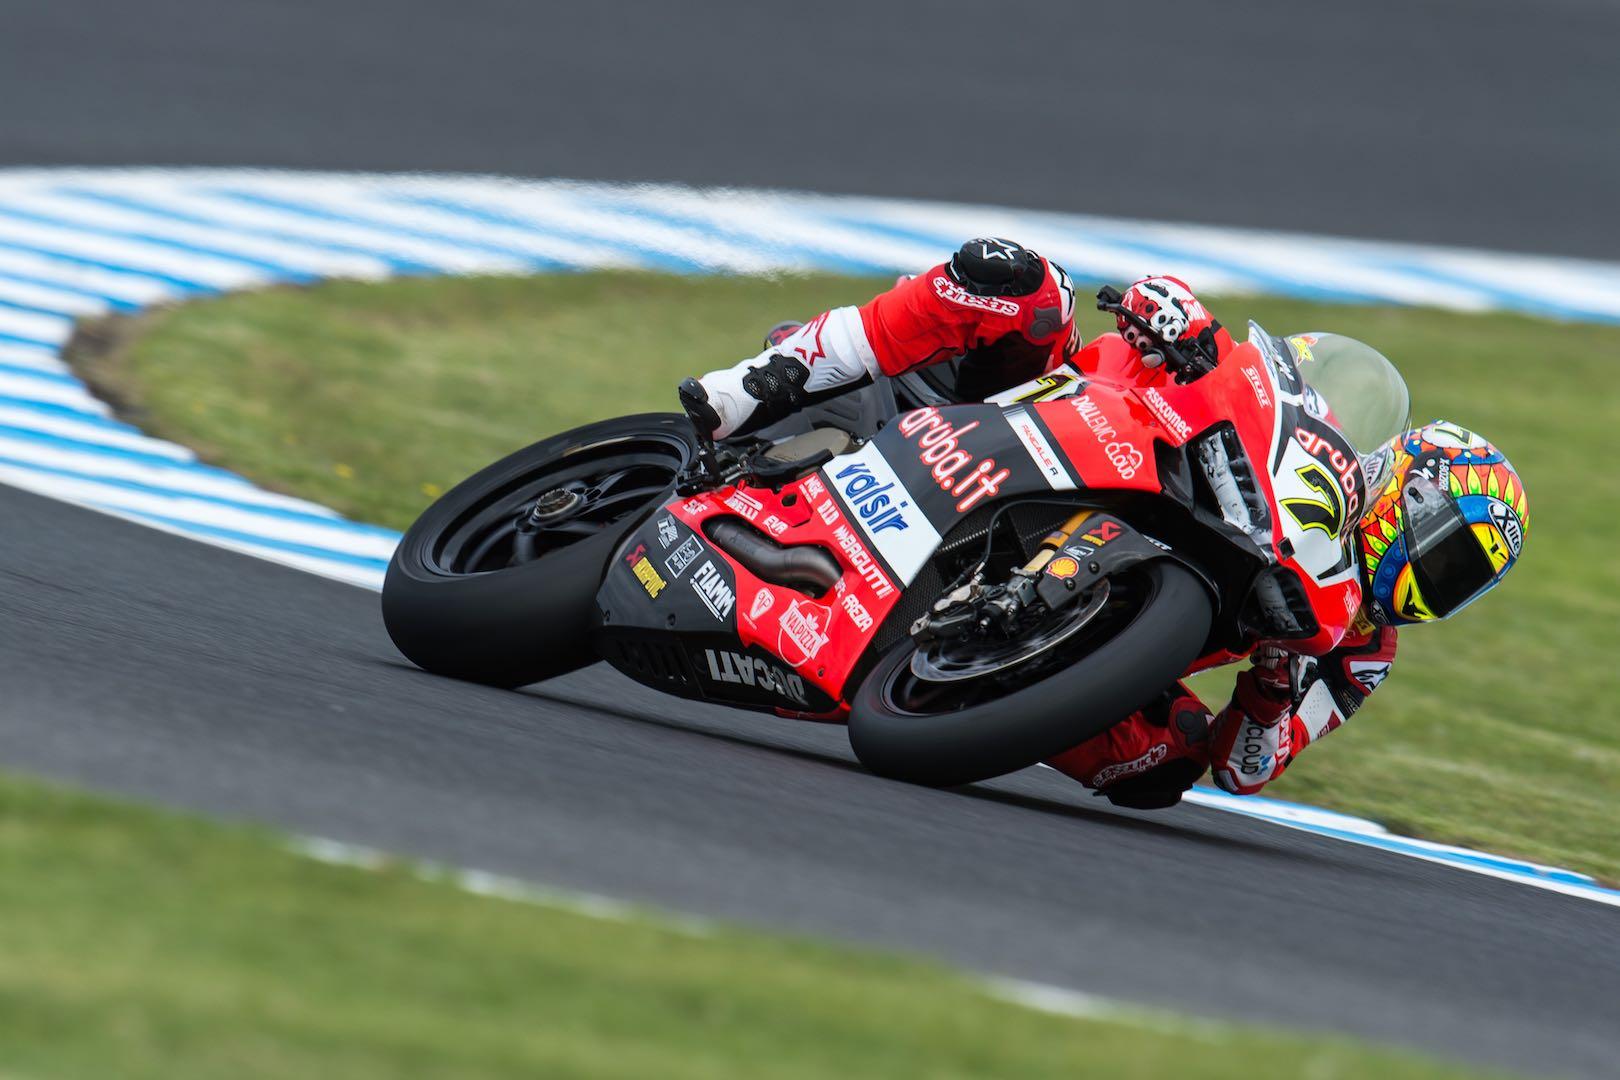 2018 World Superbike Calendar Ducati Chaz Davies